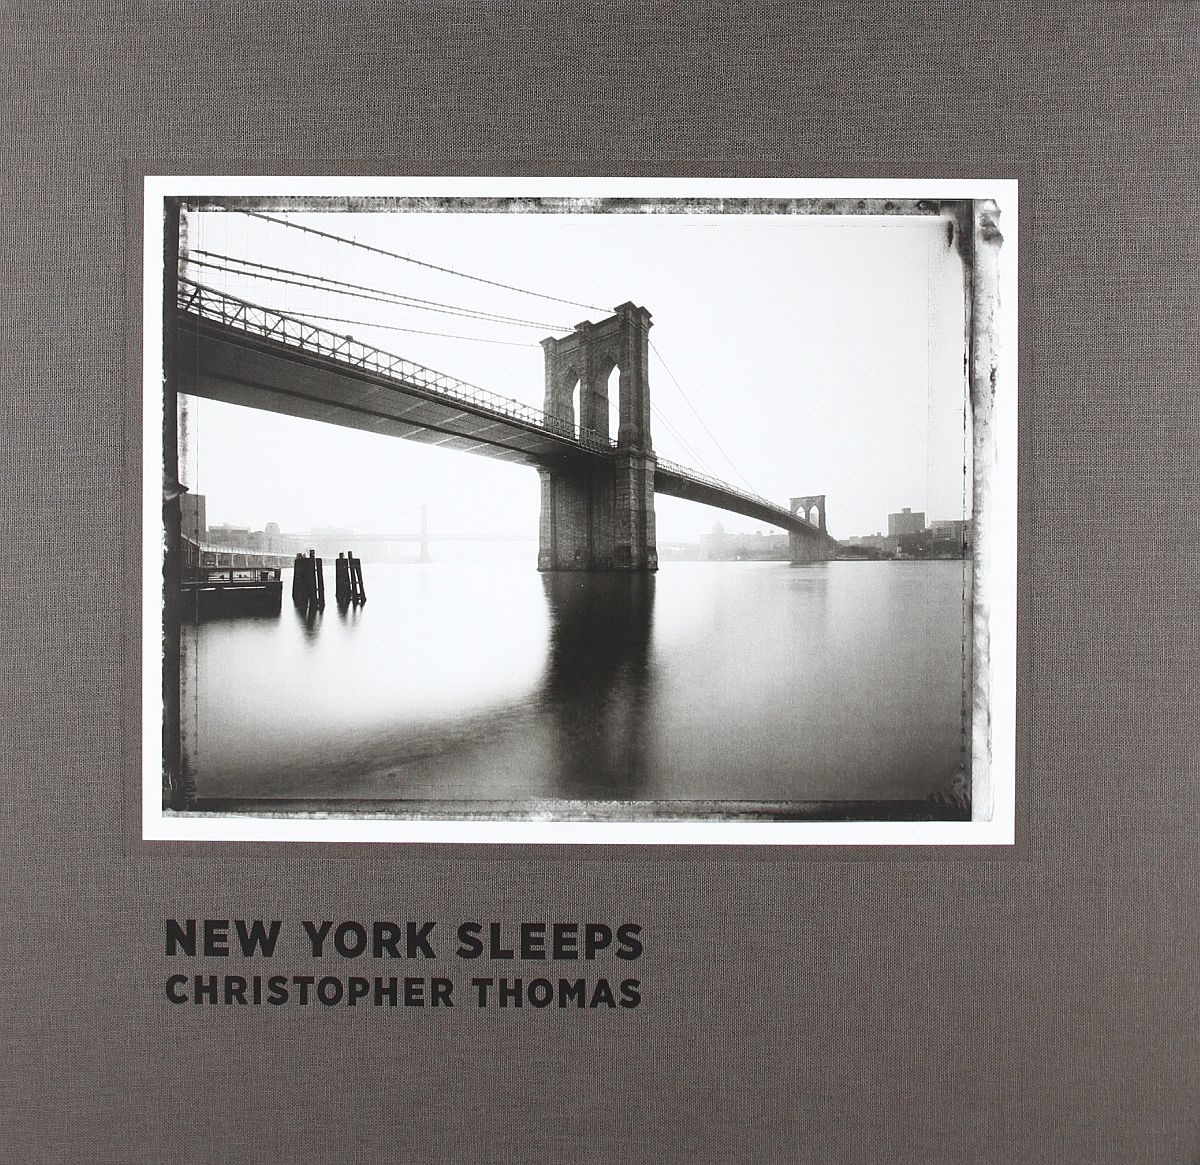 christopher-thomas-new-york-sleeps-00-cover